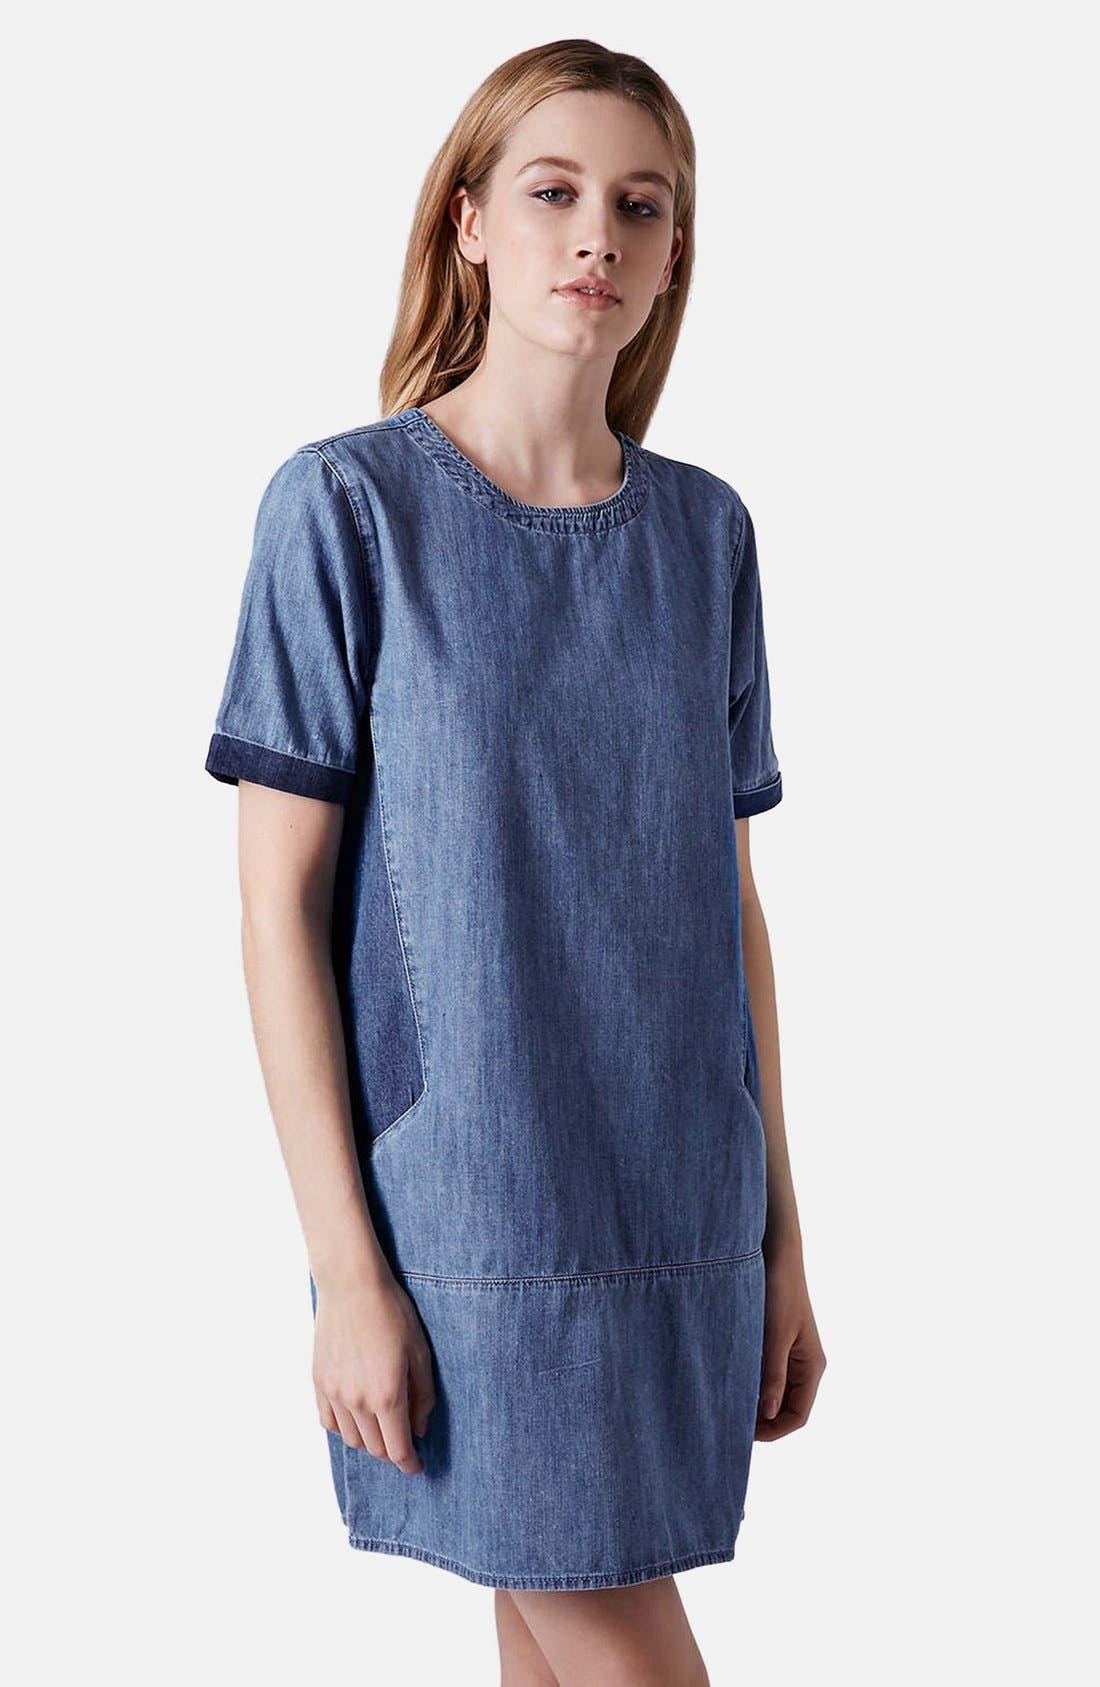 Main Image - Topshop Moto Colorblock Denim T-Shirt Dress